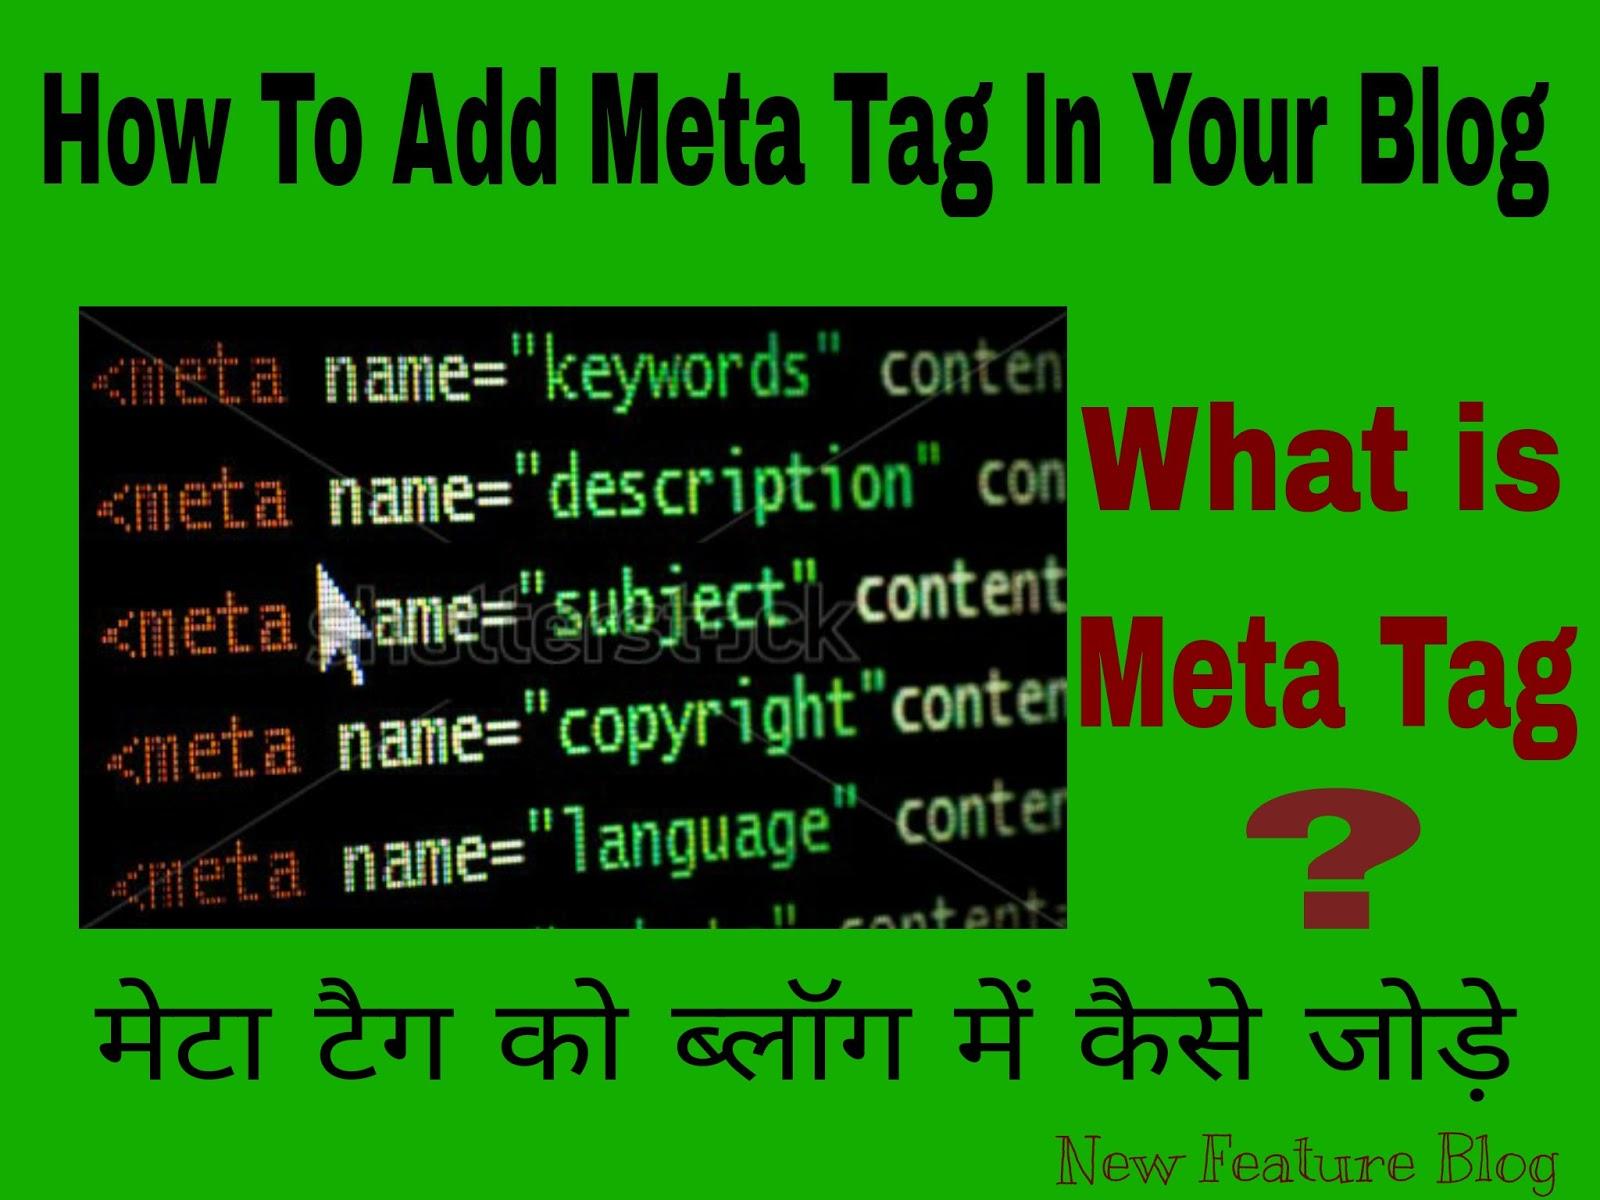 Meta Tag Ko Blog Me Kaise Add Kare ? - New Feature Blog